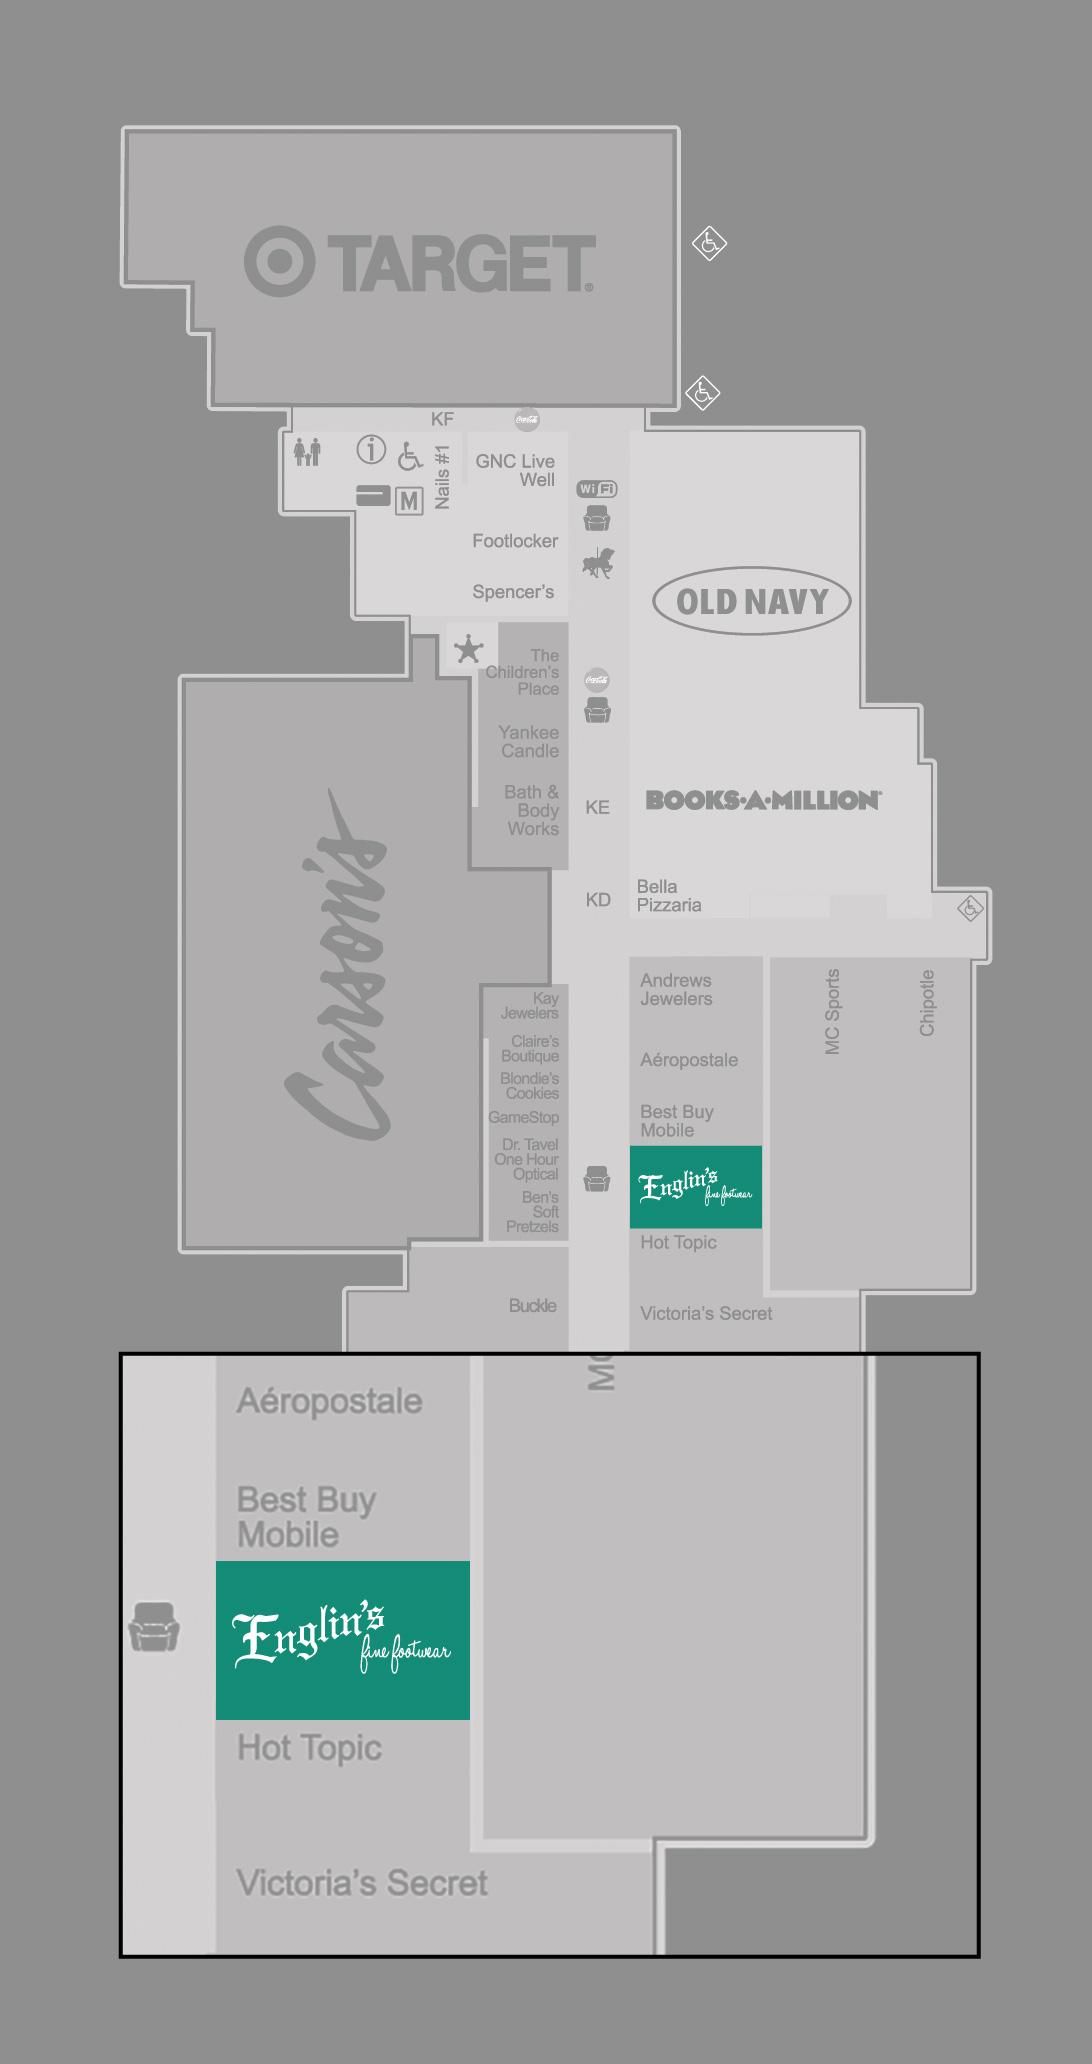 markland-mall-map-location-1.1.jpg